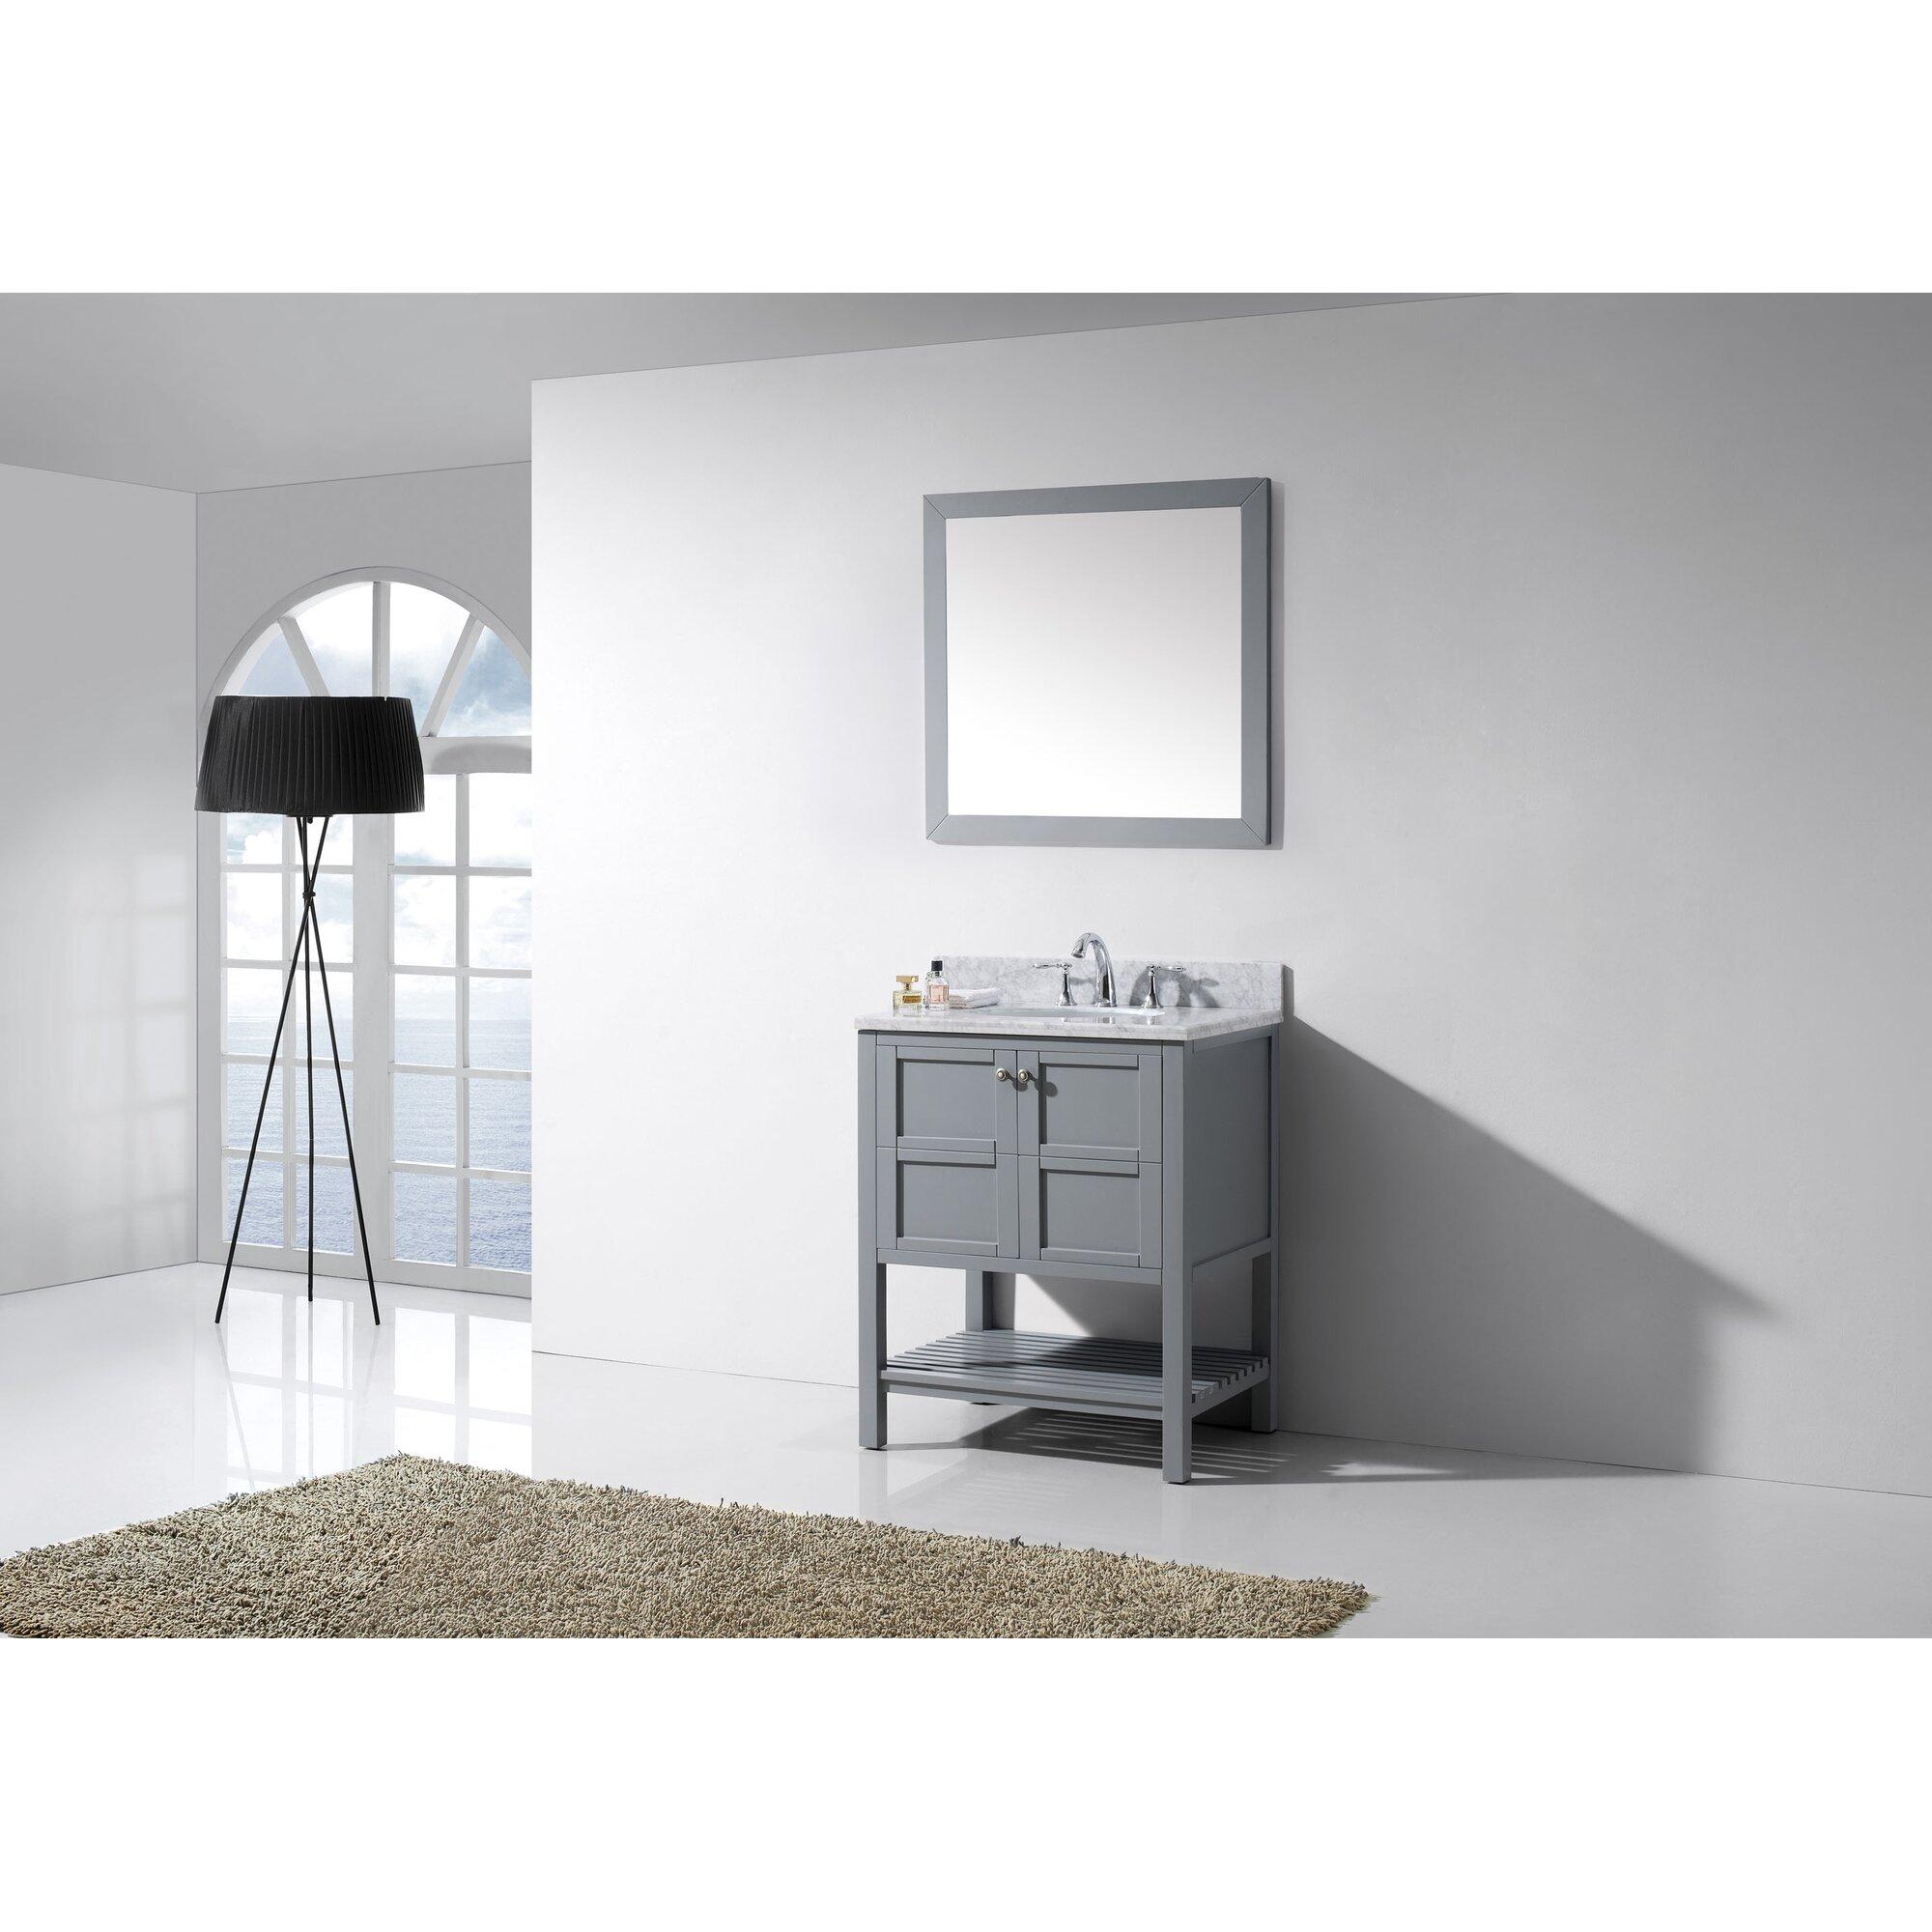 Virtu bathroom accessories - Winterfell 30 Single Bathroom Vanity Set With White Marble Top And Mirror